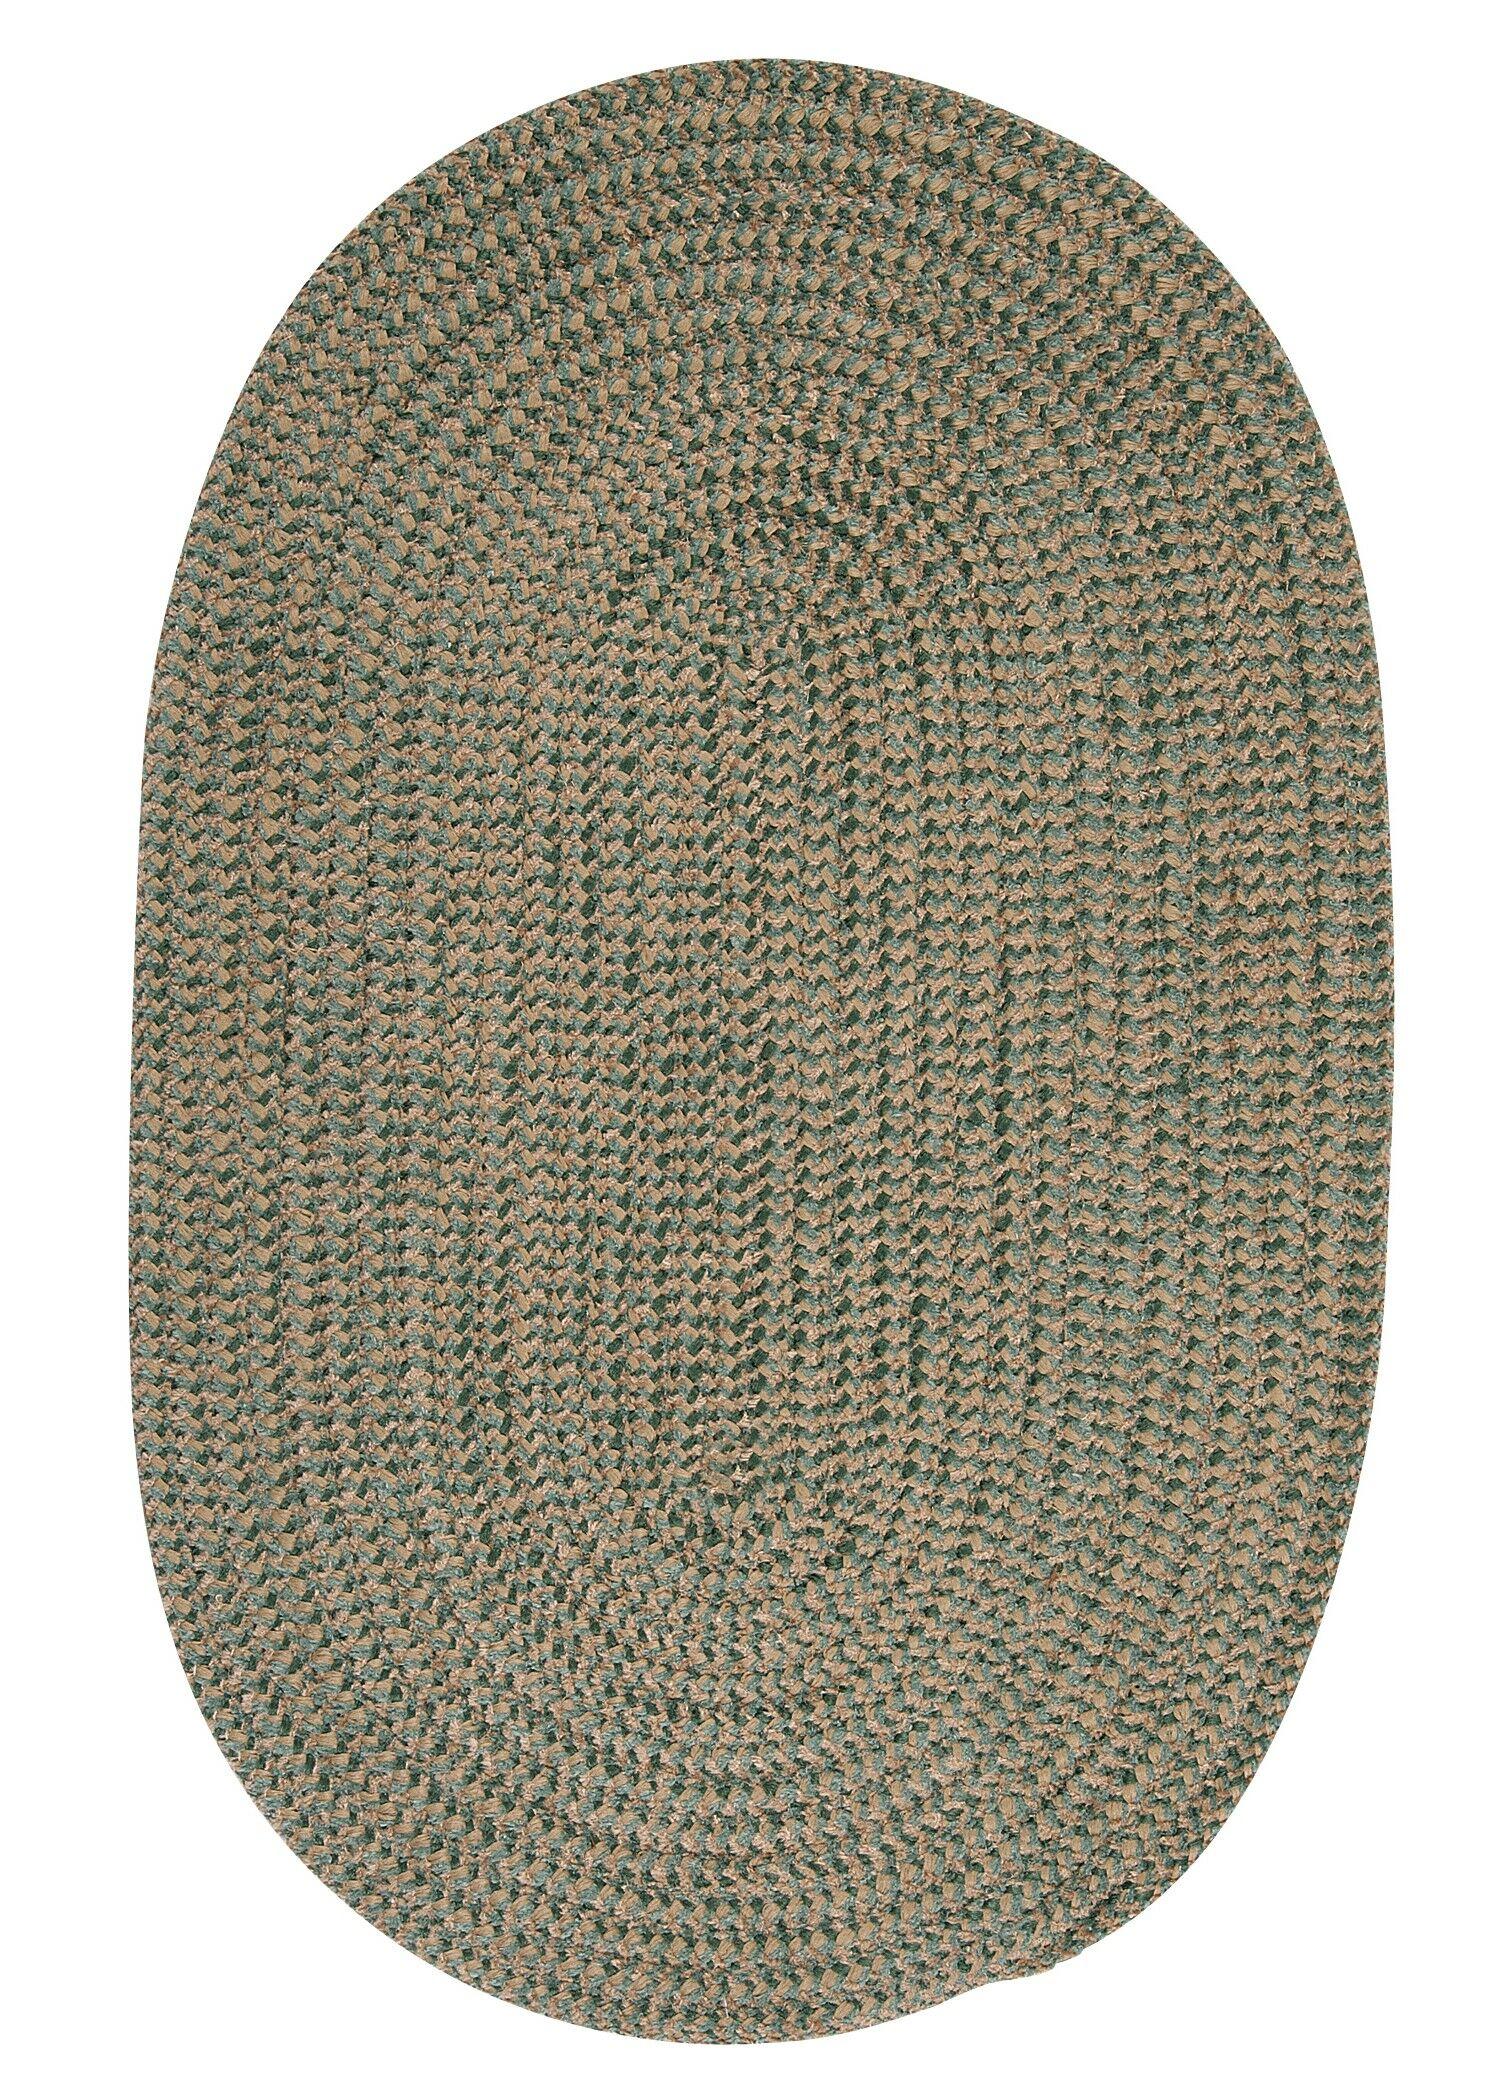 Hale Myrtle Green Check Indoor/Outdoor Area Rug Rug Size: Round 6'